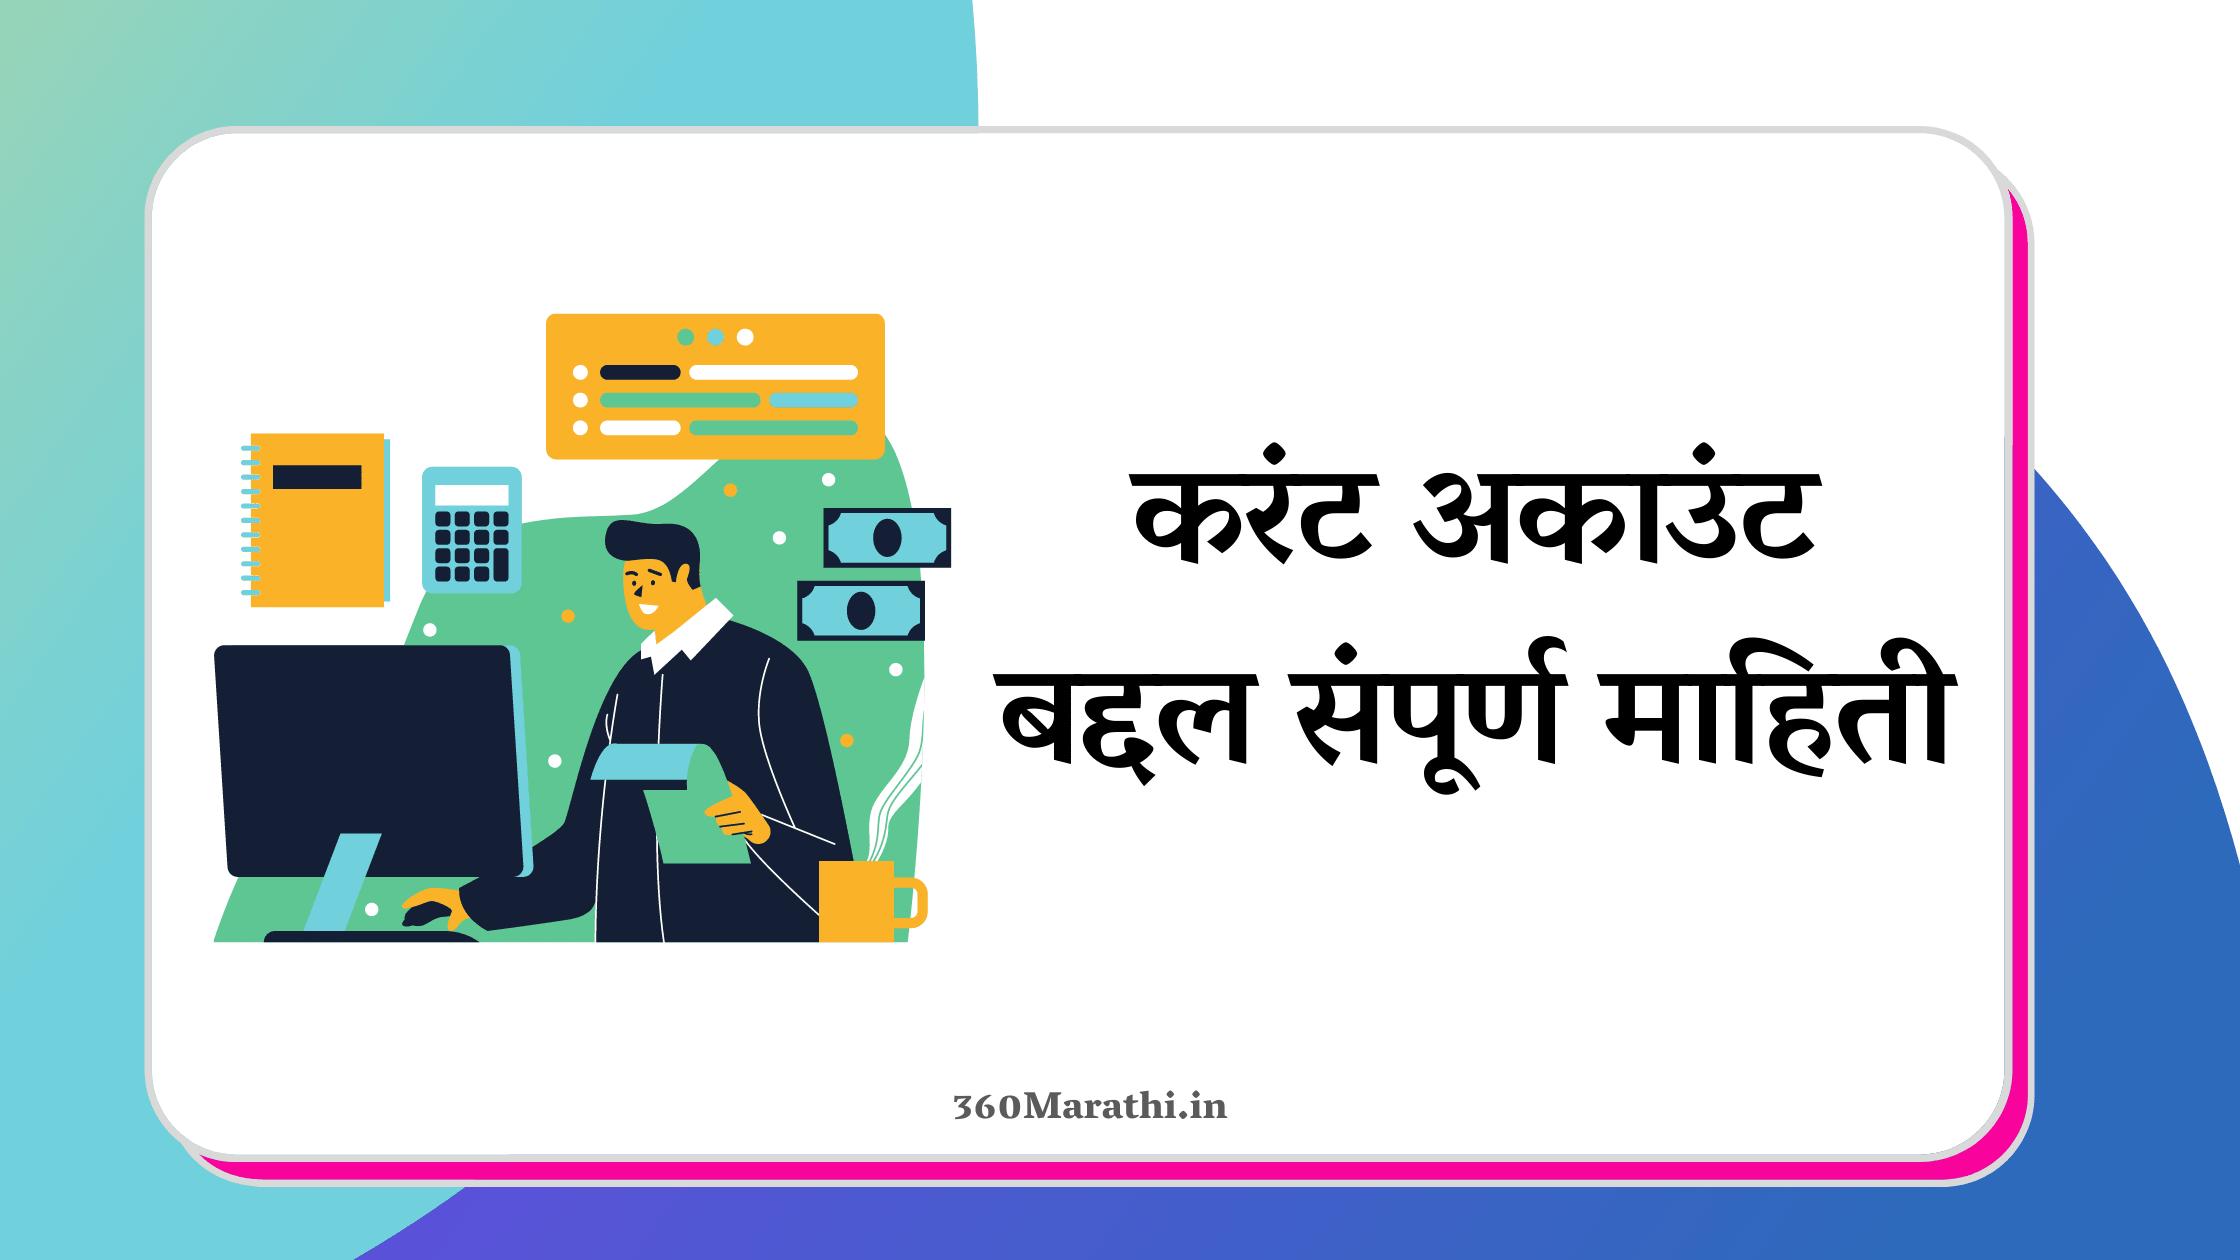 करंट अकाउंट म्हणजे काय   Current Account Information in Marathi